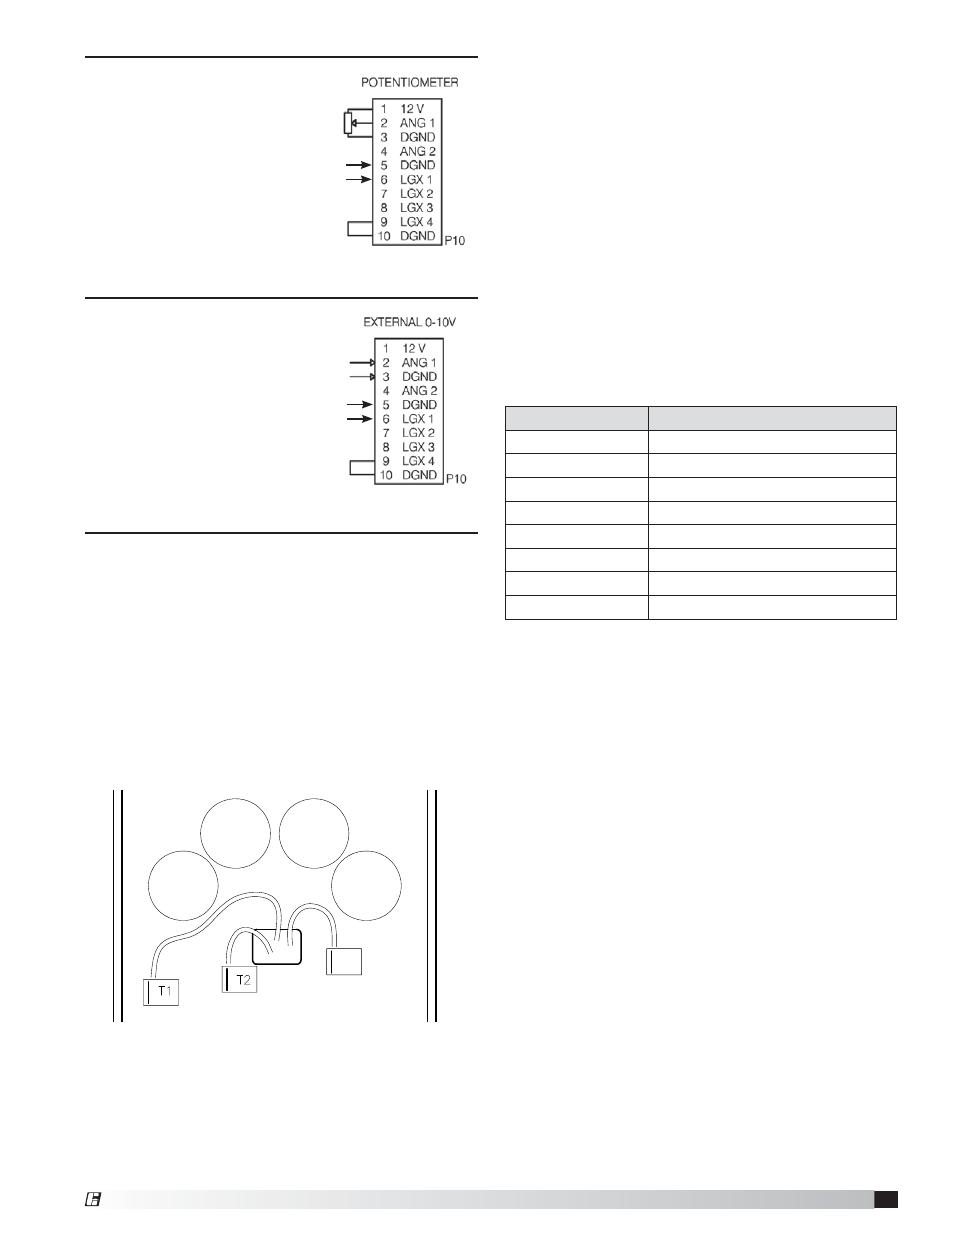 greenheck wiring diagrams wiring diagrams ford 63 galaxie 500 greenheck ecm motor wiring - wiring diagram